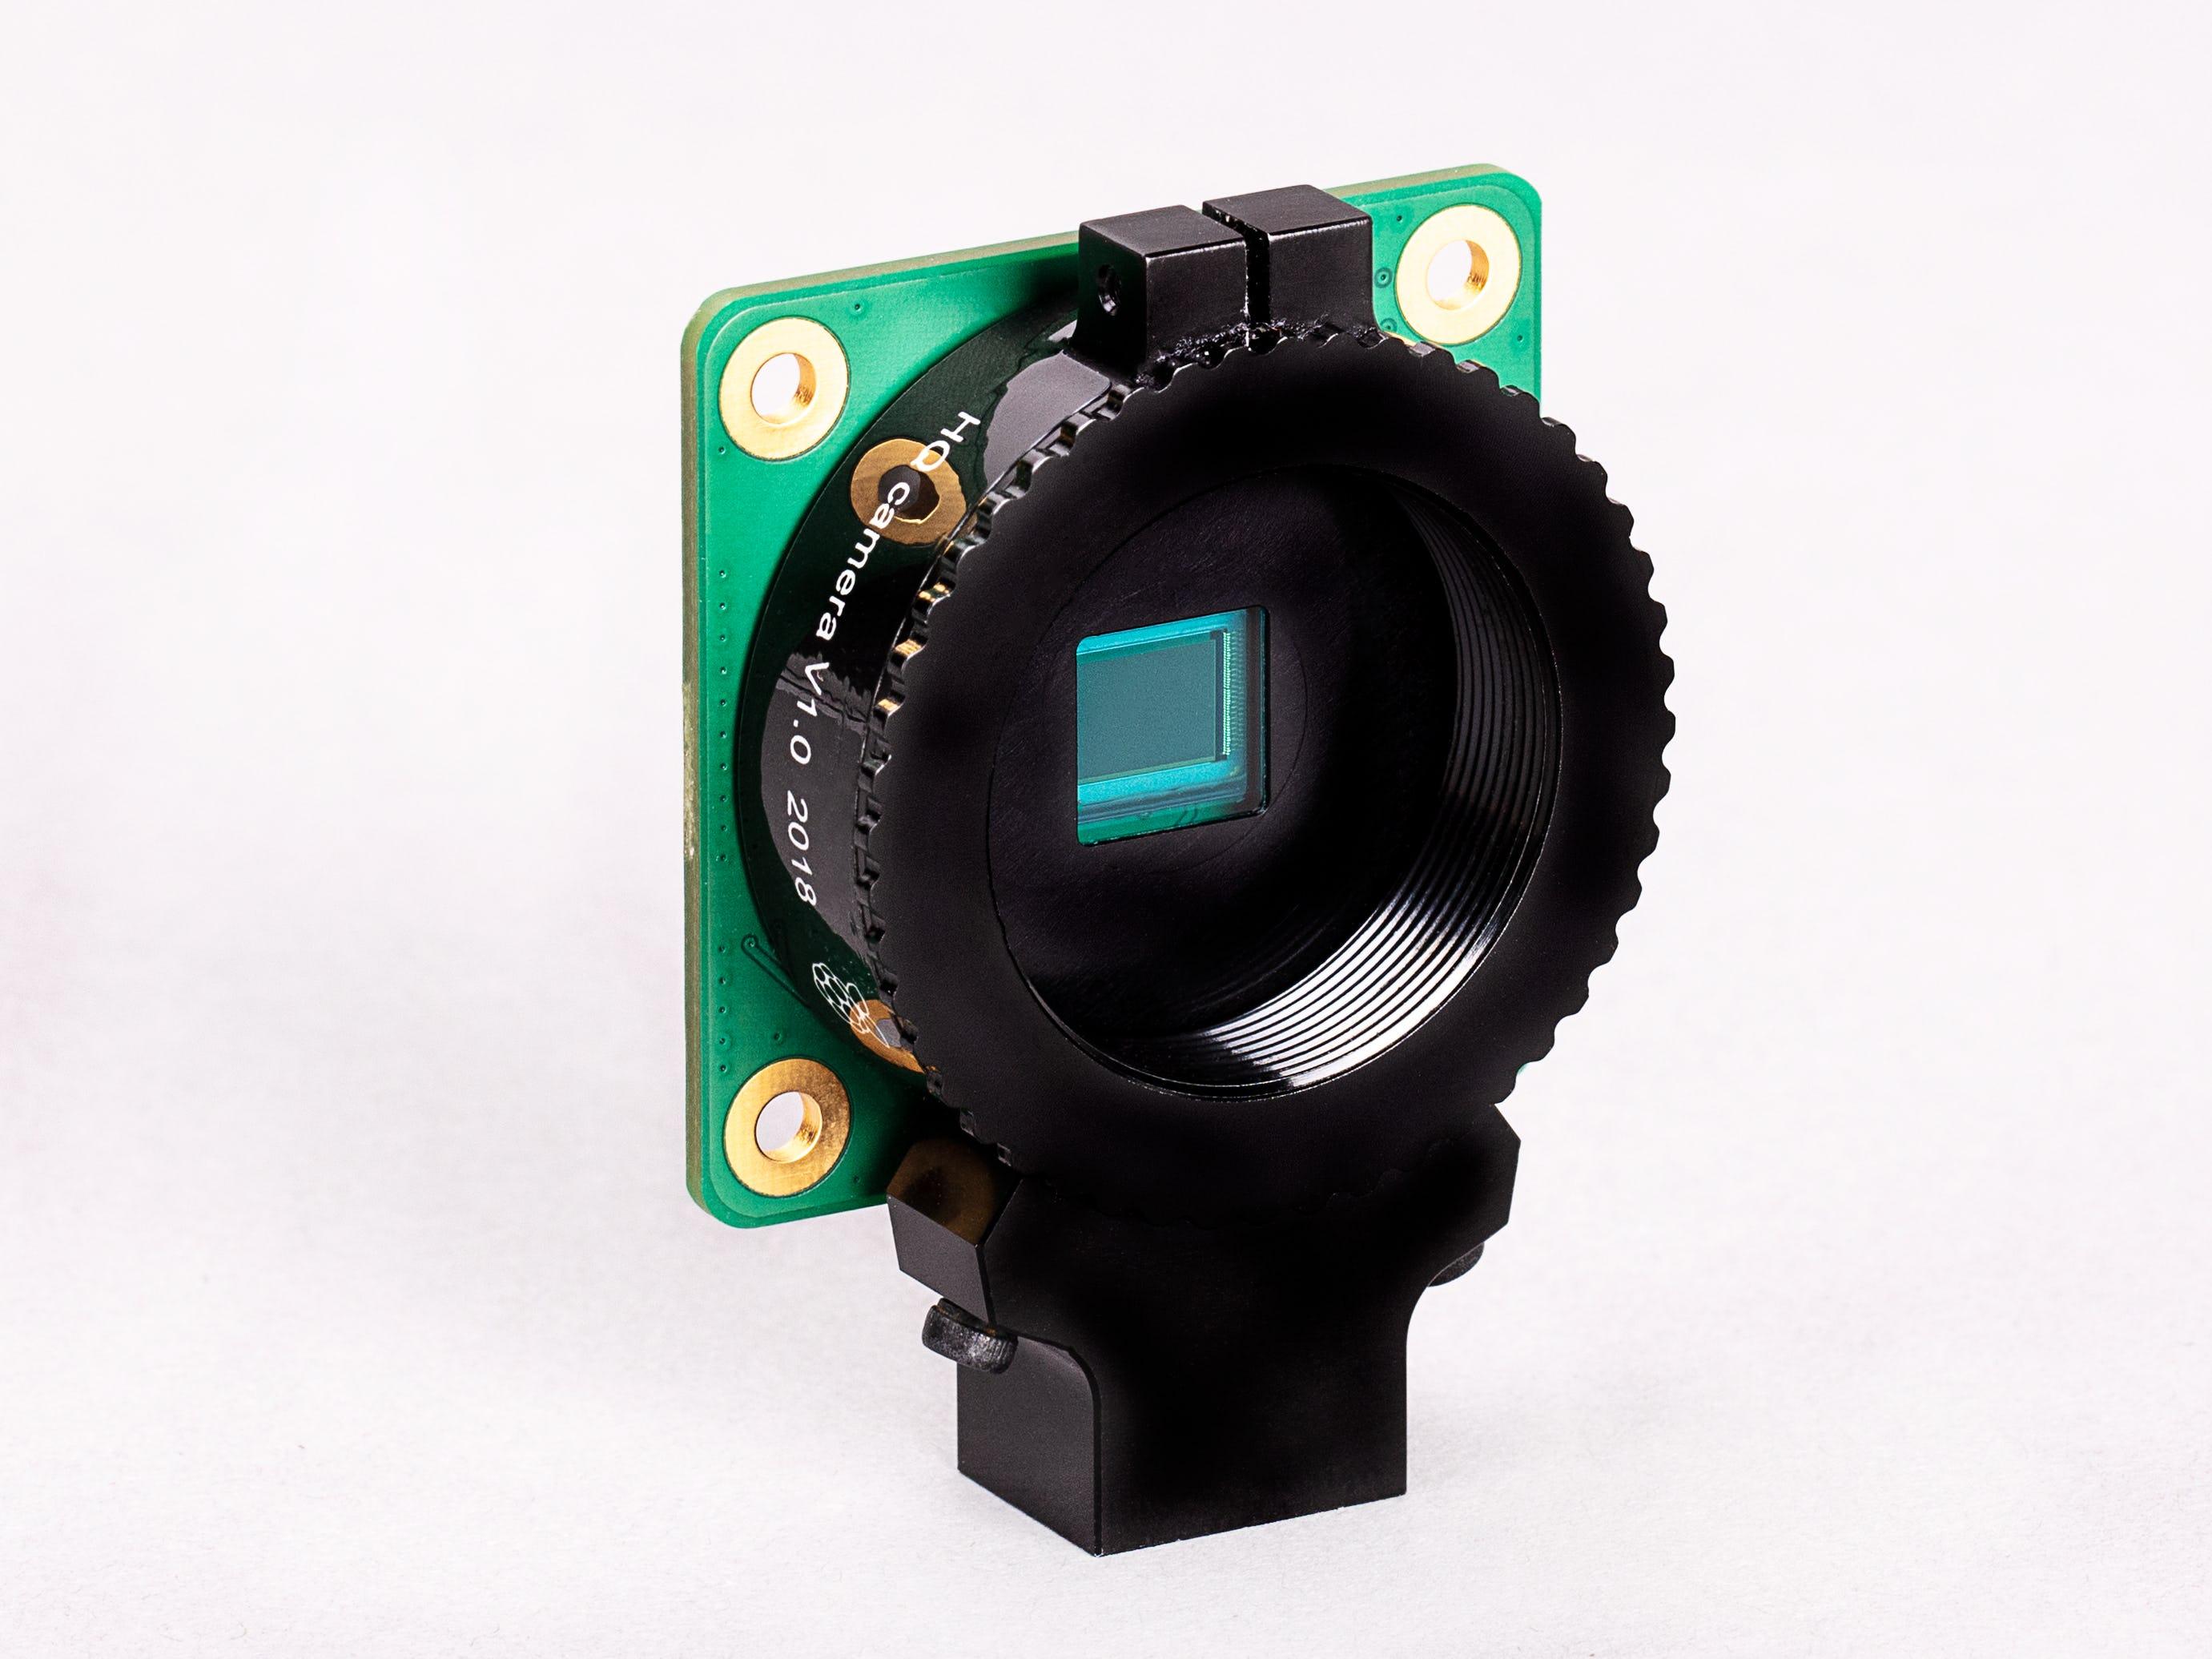 Buy a Raspberry Pi High Quality Camera – Raspberry Pi